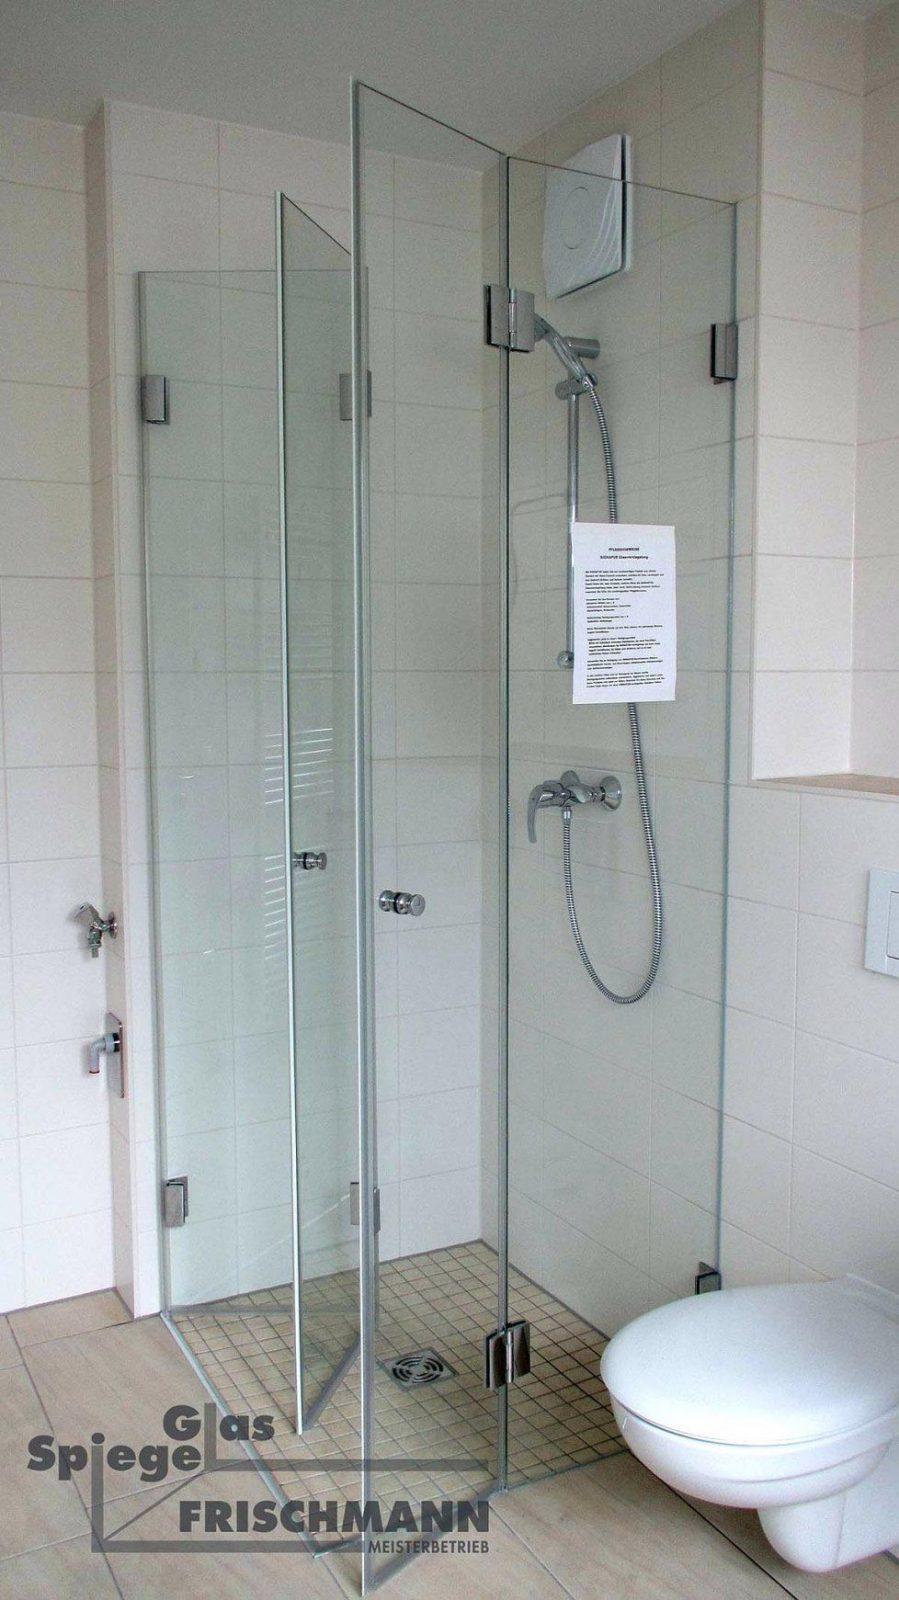 Dusche Wandverkleidung Ohne Fugen | Haus Design Ideen